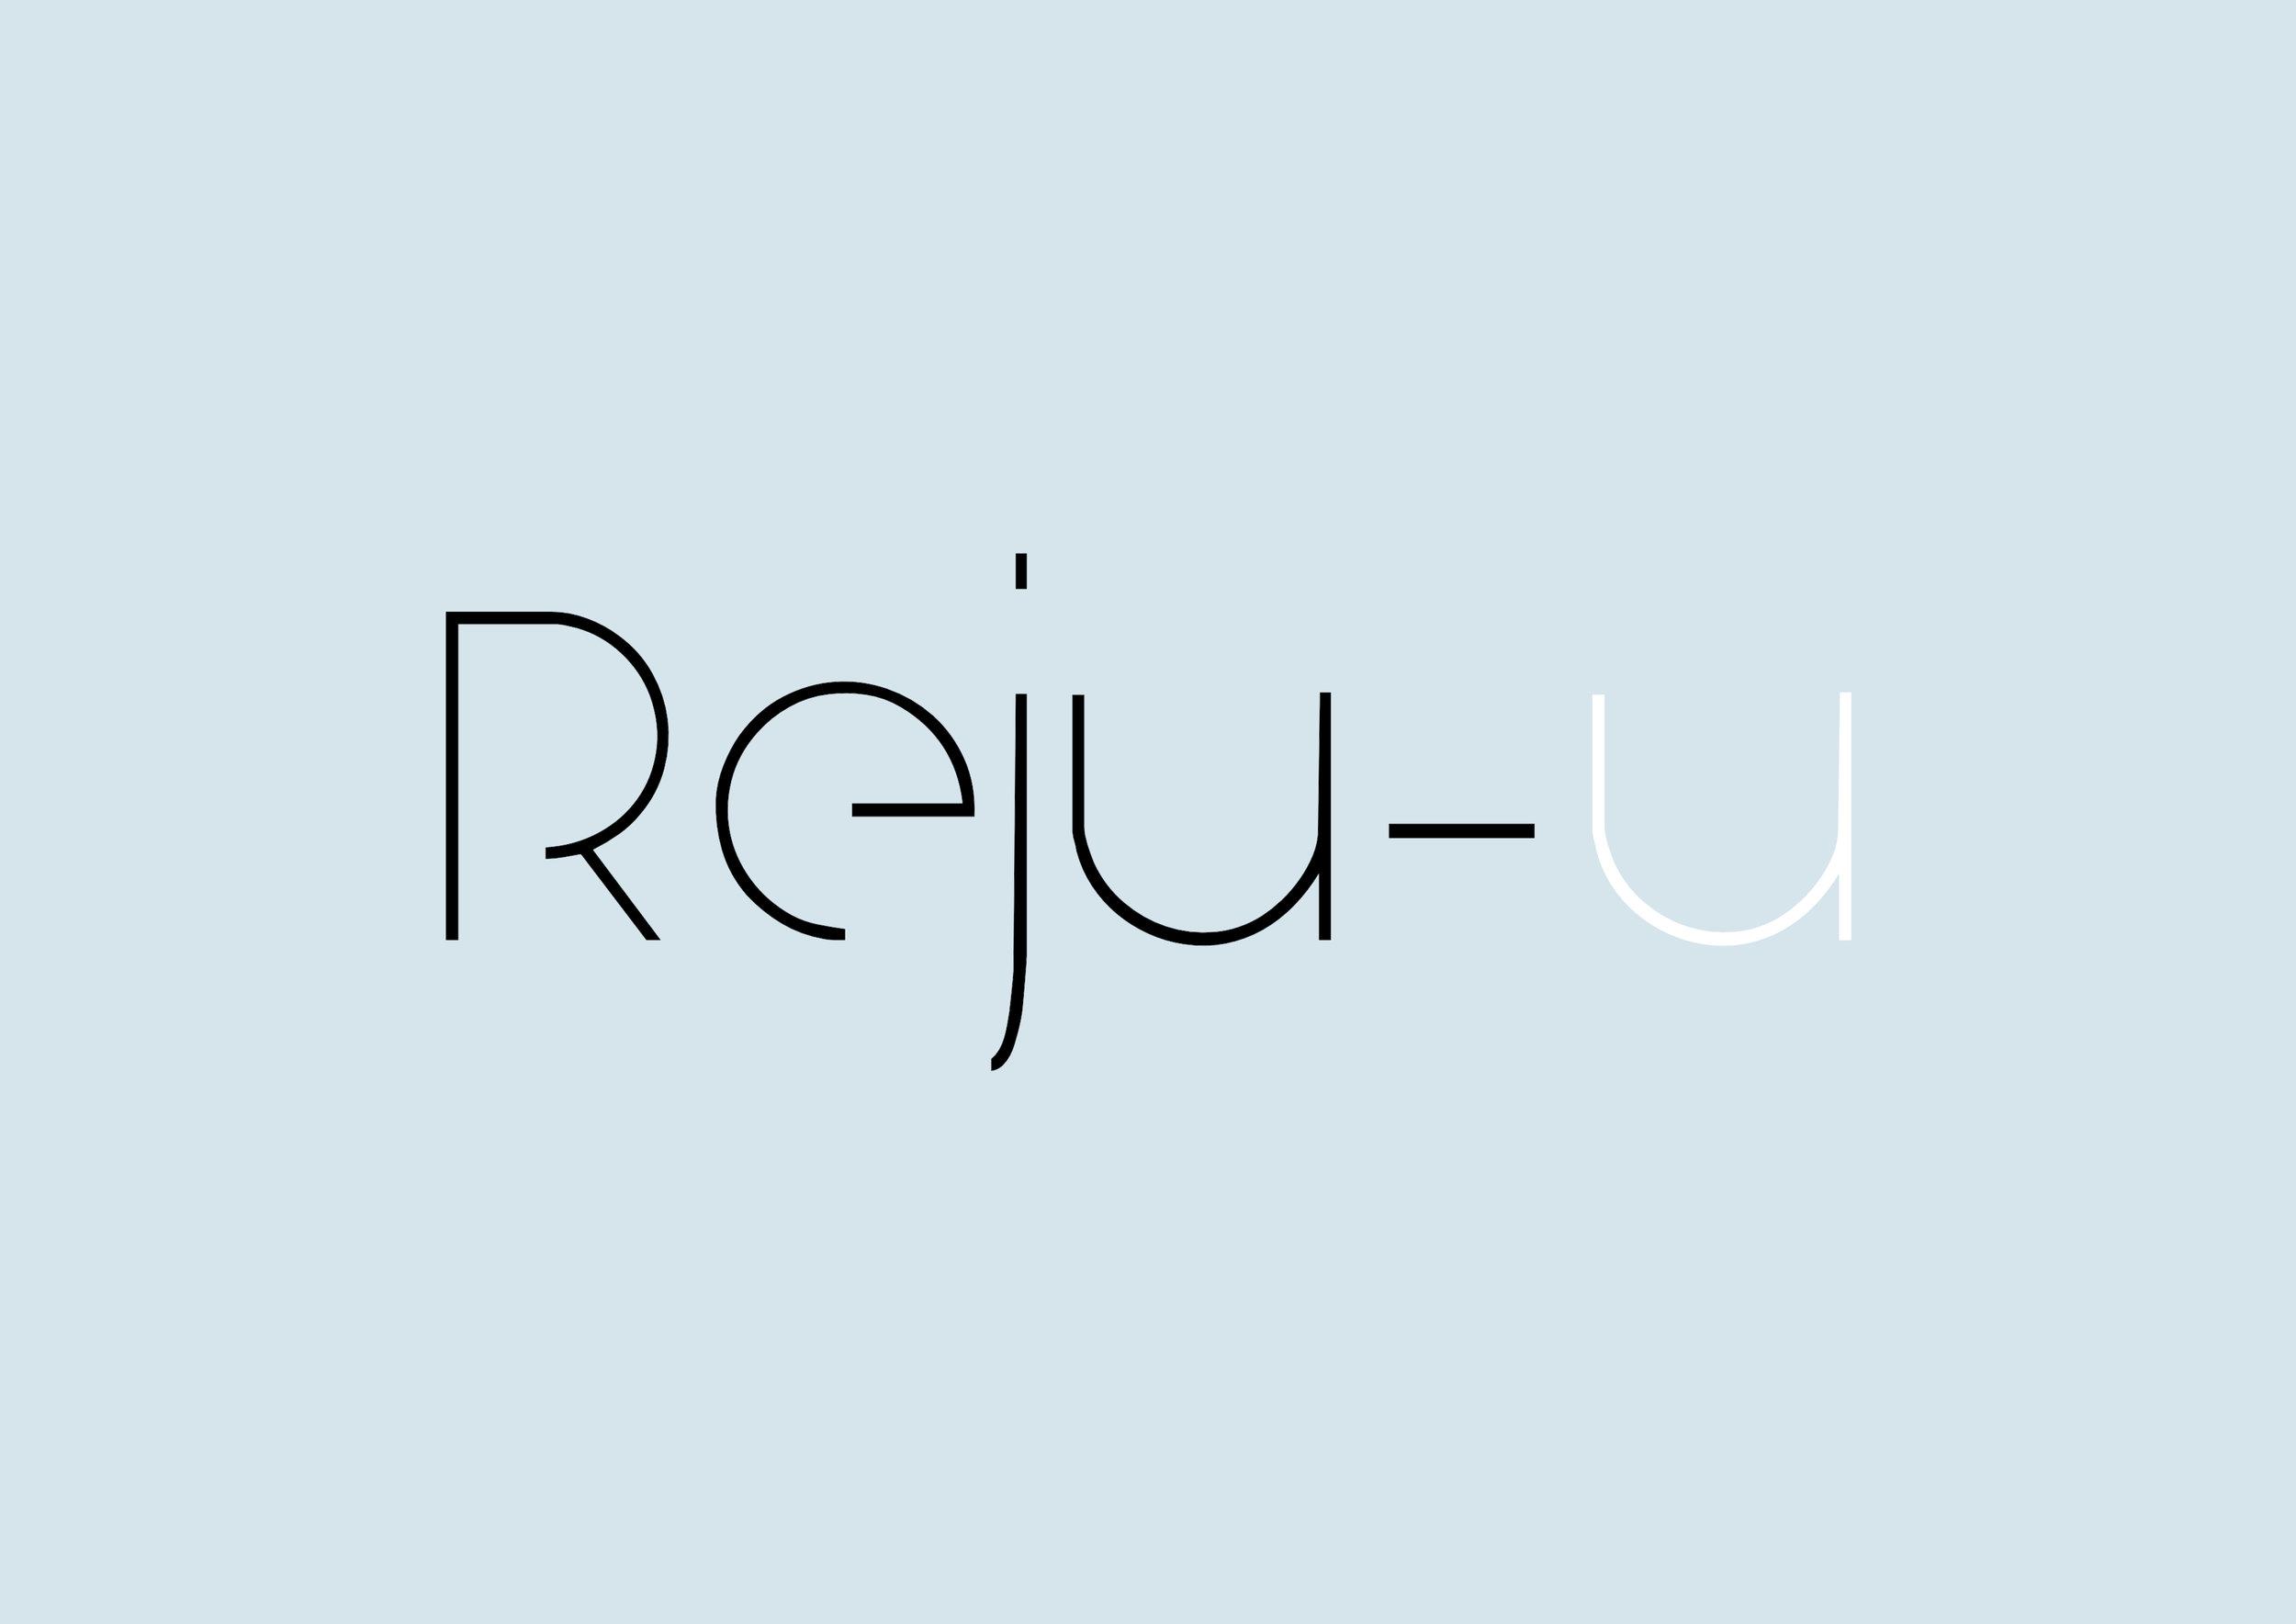 reju blue white.jpg